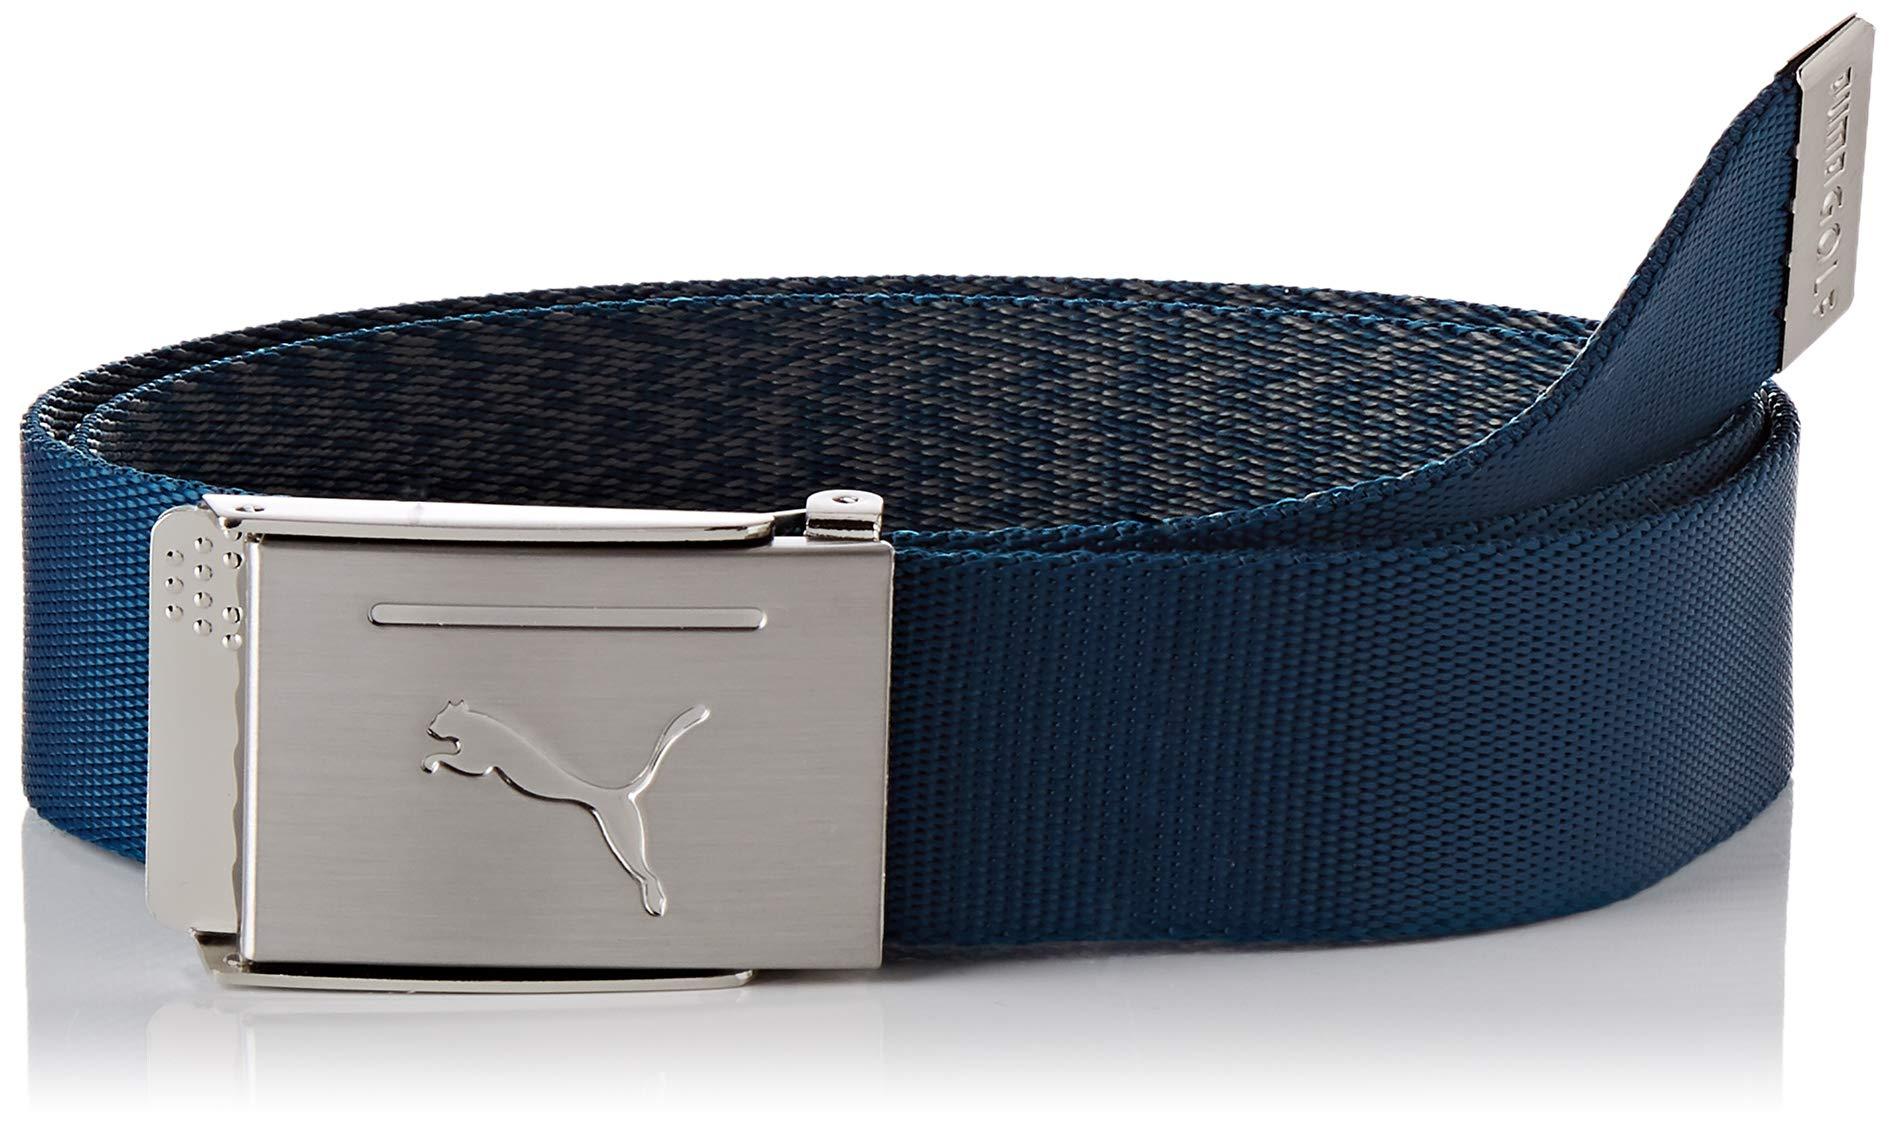 PUMA Reversible Web Belt Cintura Uomo 1 spesavip